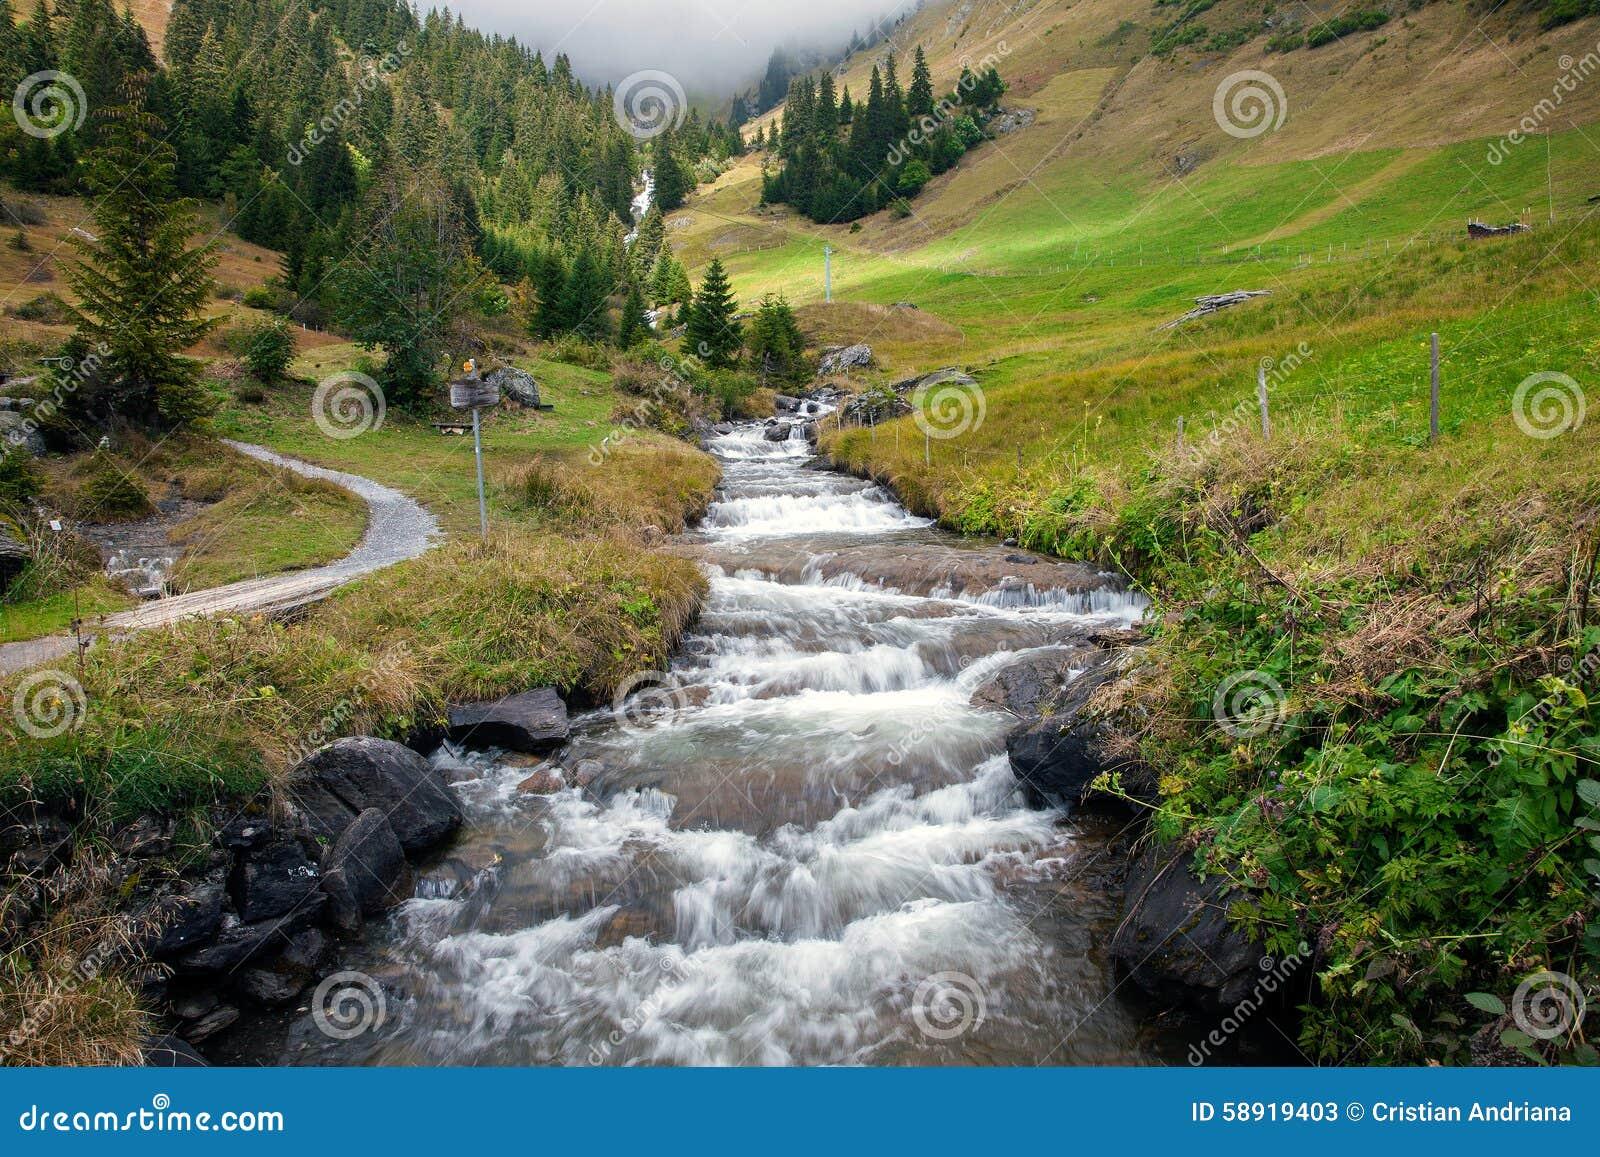 Grindelwald Stream